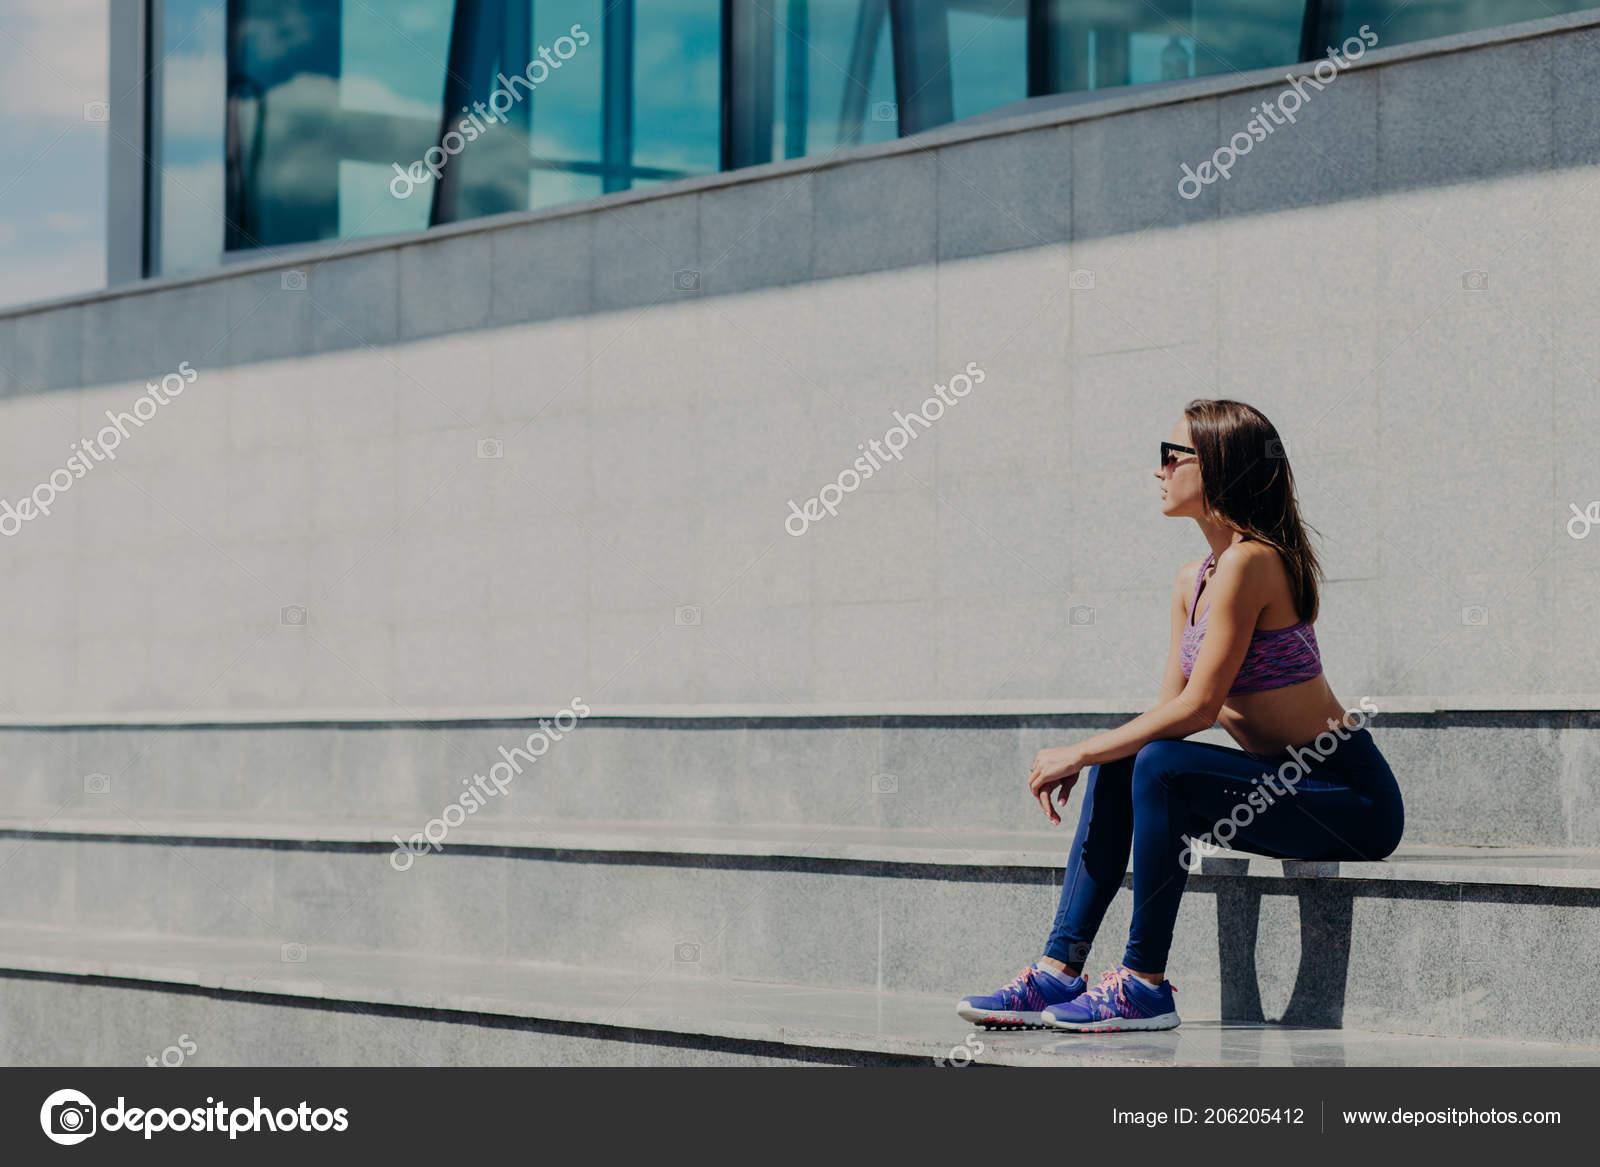 56f68b195f0 Οριζόντια Βολή Του Όμορφη Γυναίκα Σπορ Casual Ρούχα Κάθεται Σκαλοπάτια —  Φωτογραφία Αρχείου